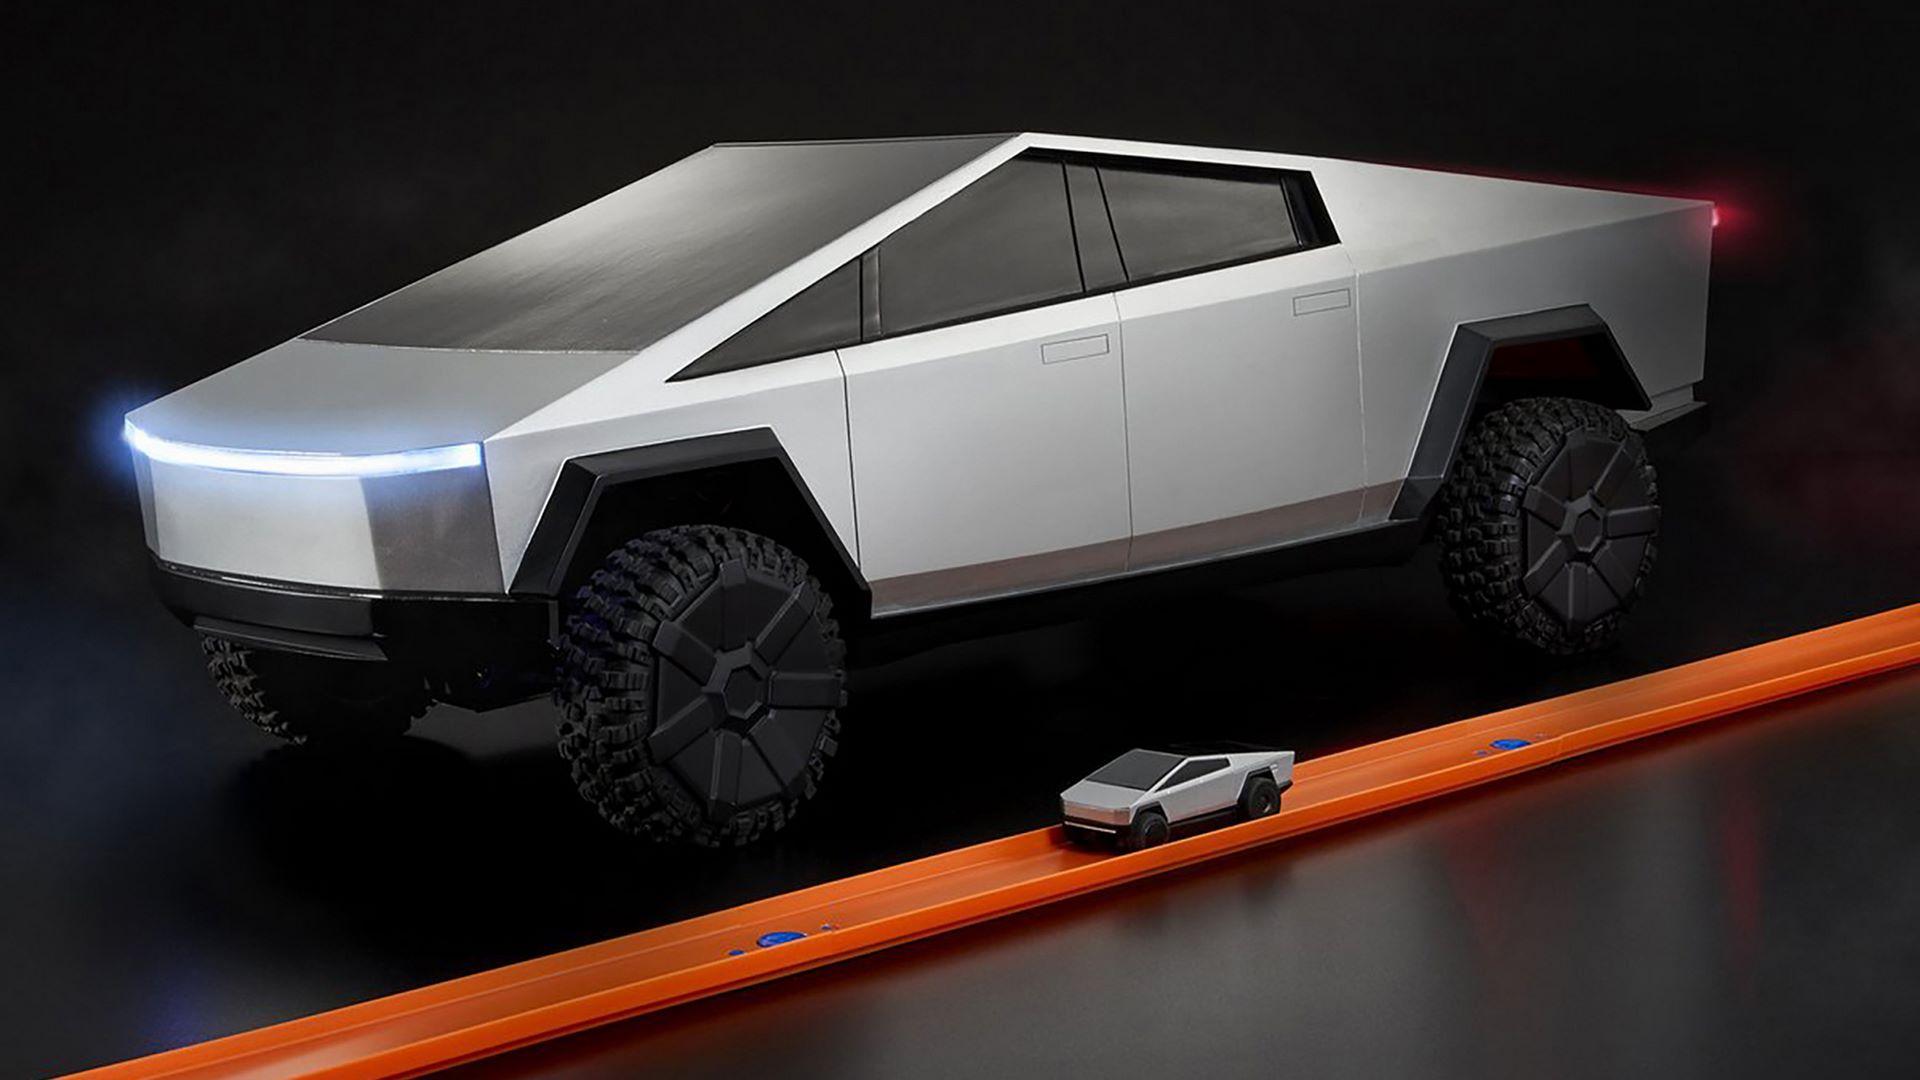 Hot-Wheels-RC-Tesla-Cybertruck-15